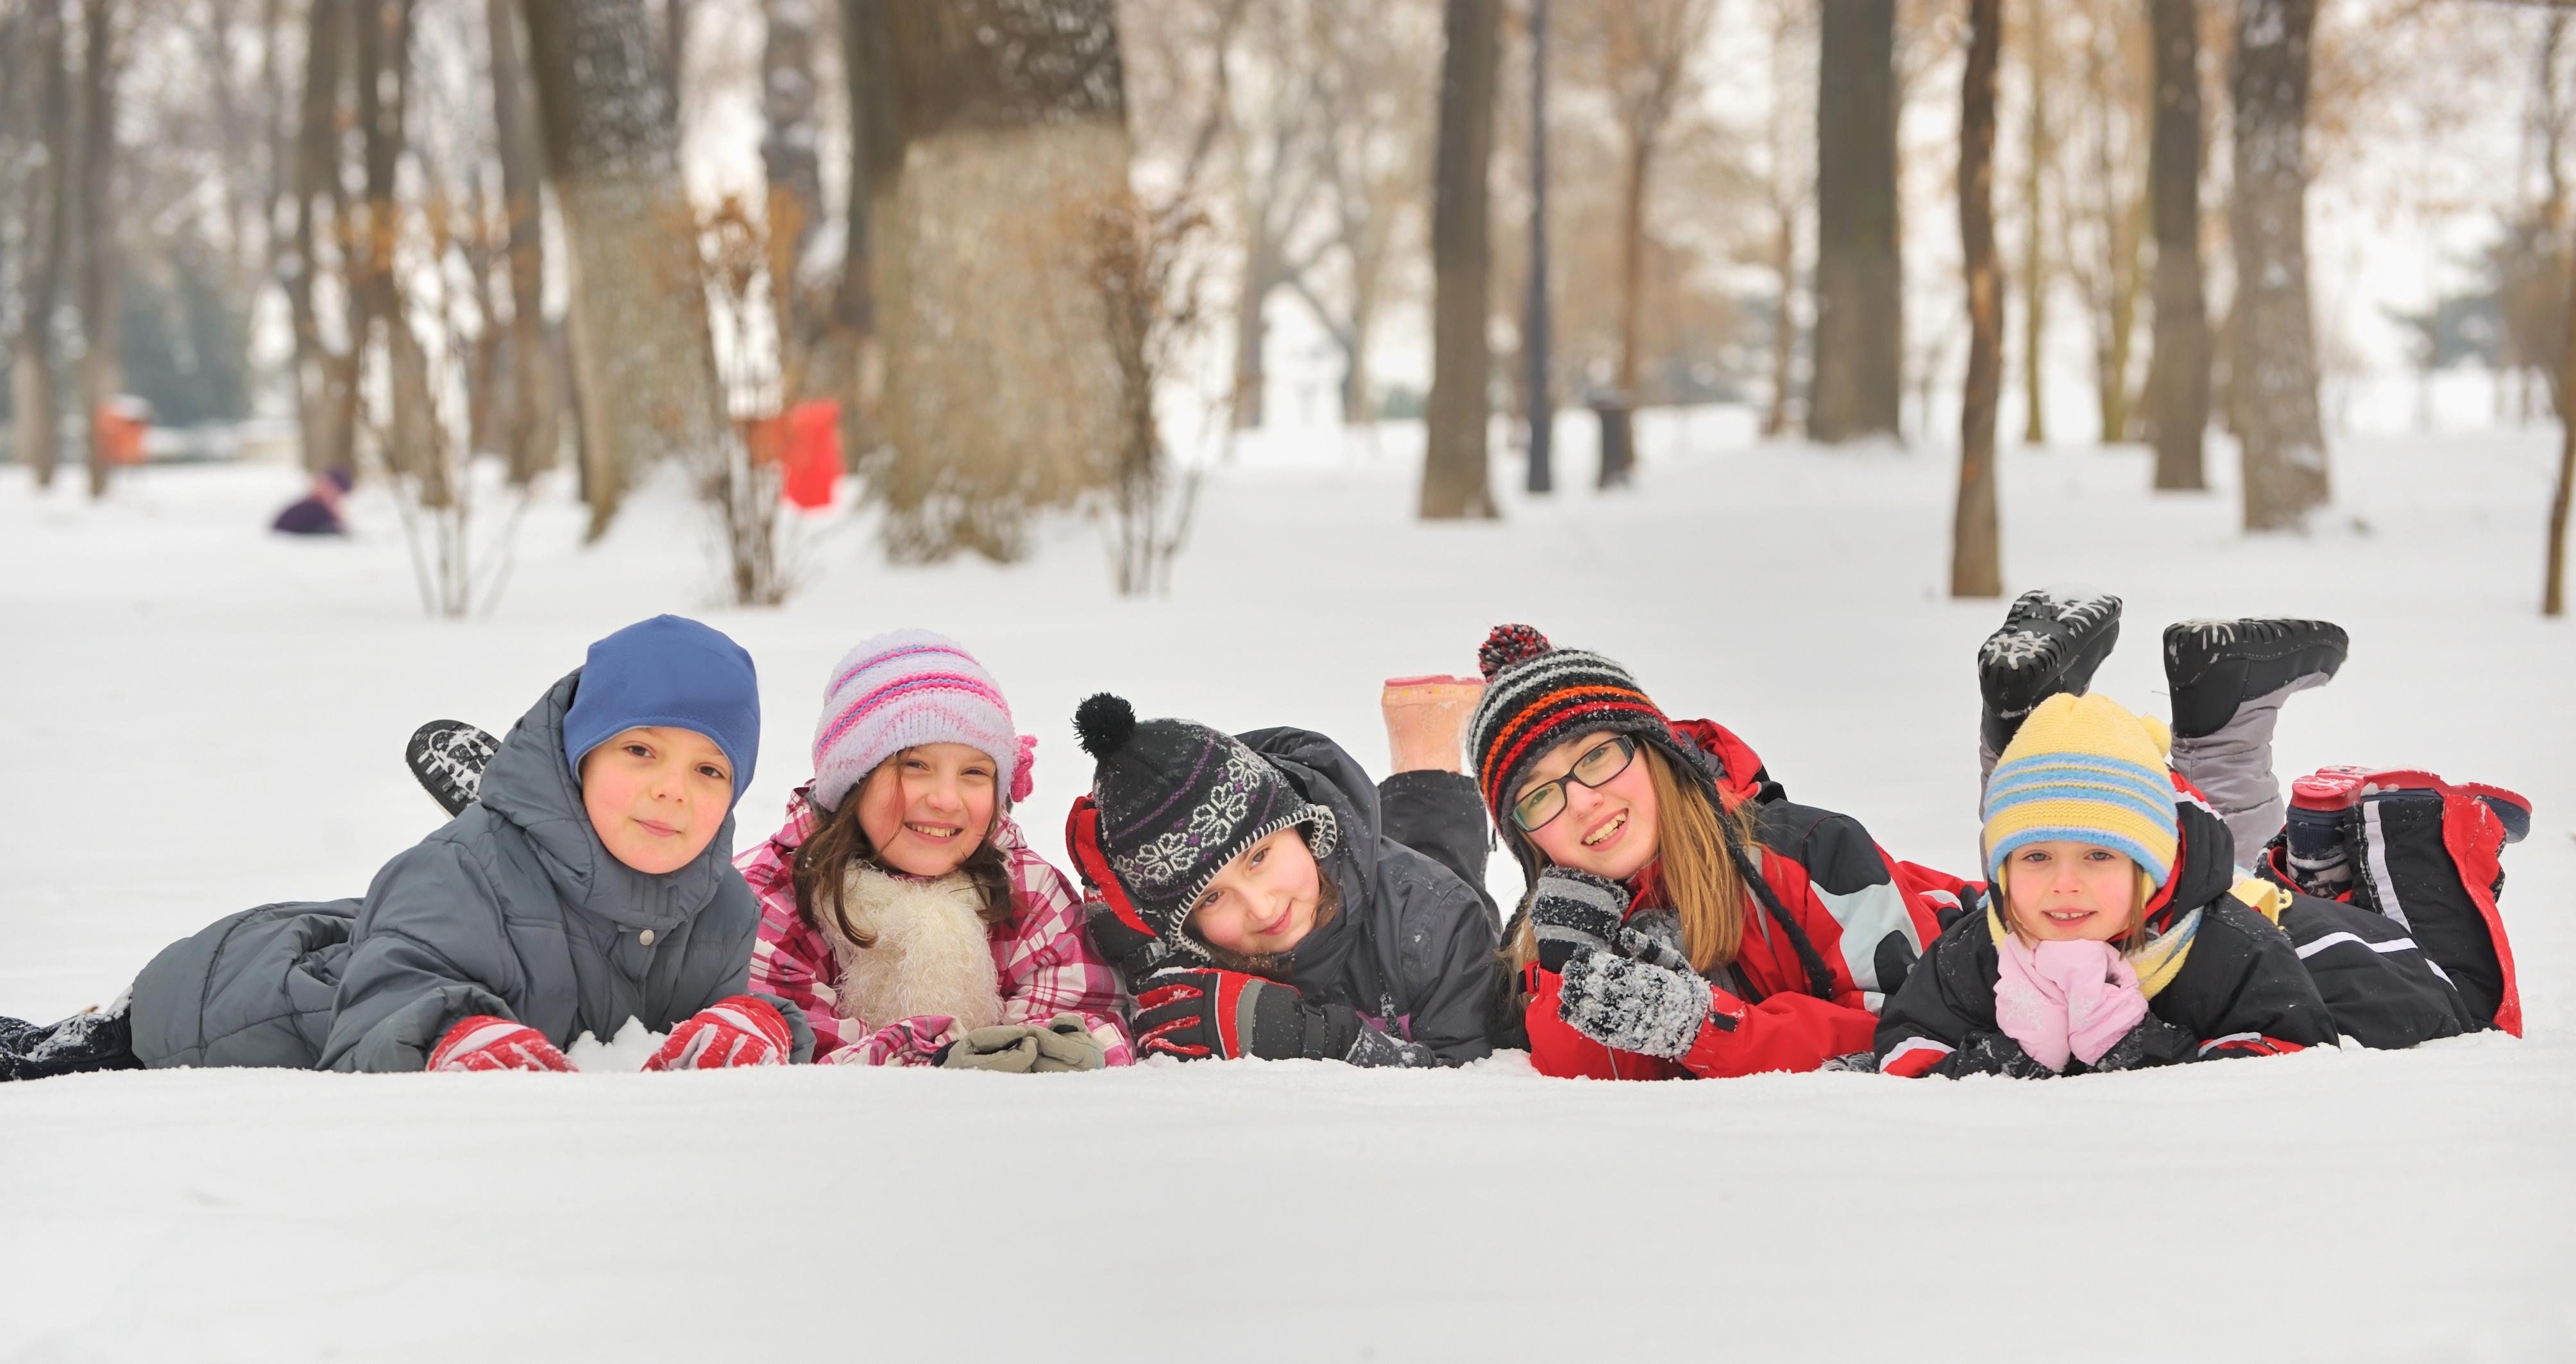 Winter Break Camp Guide 2015 | Vancouver Family Magazine